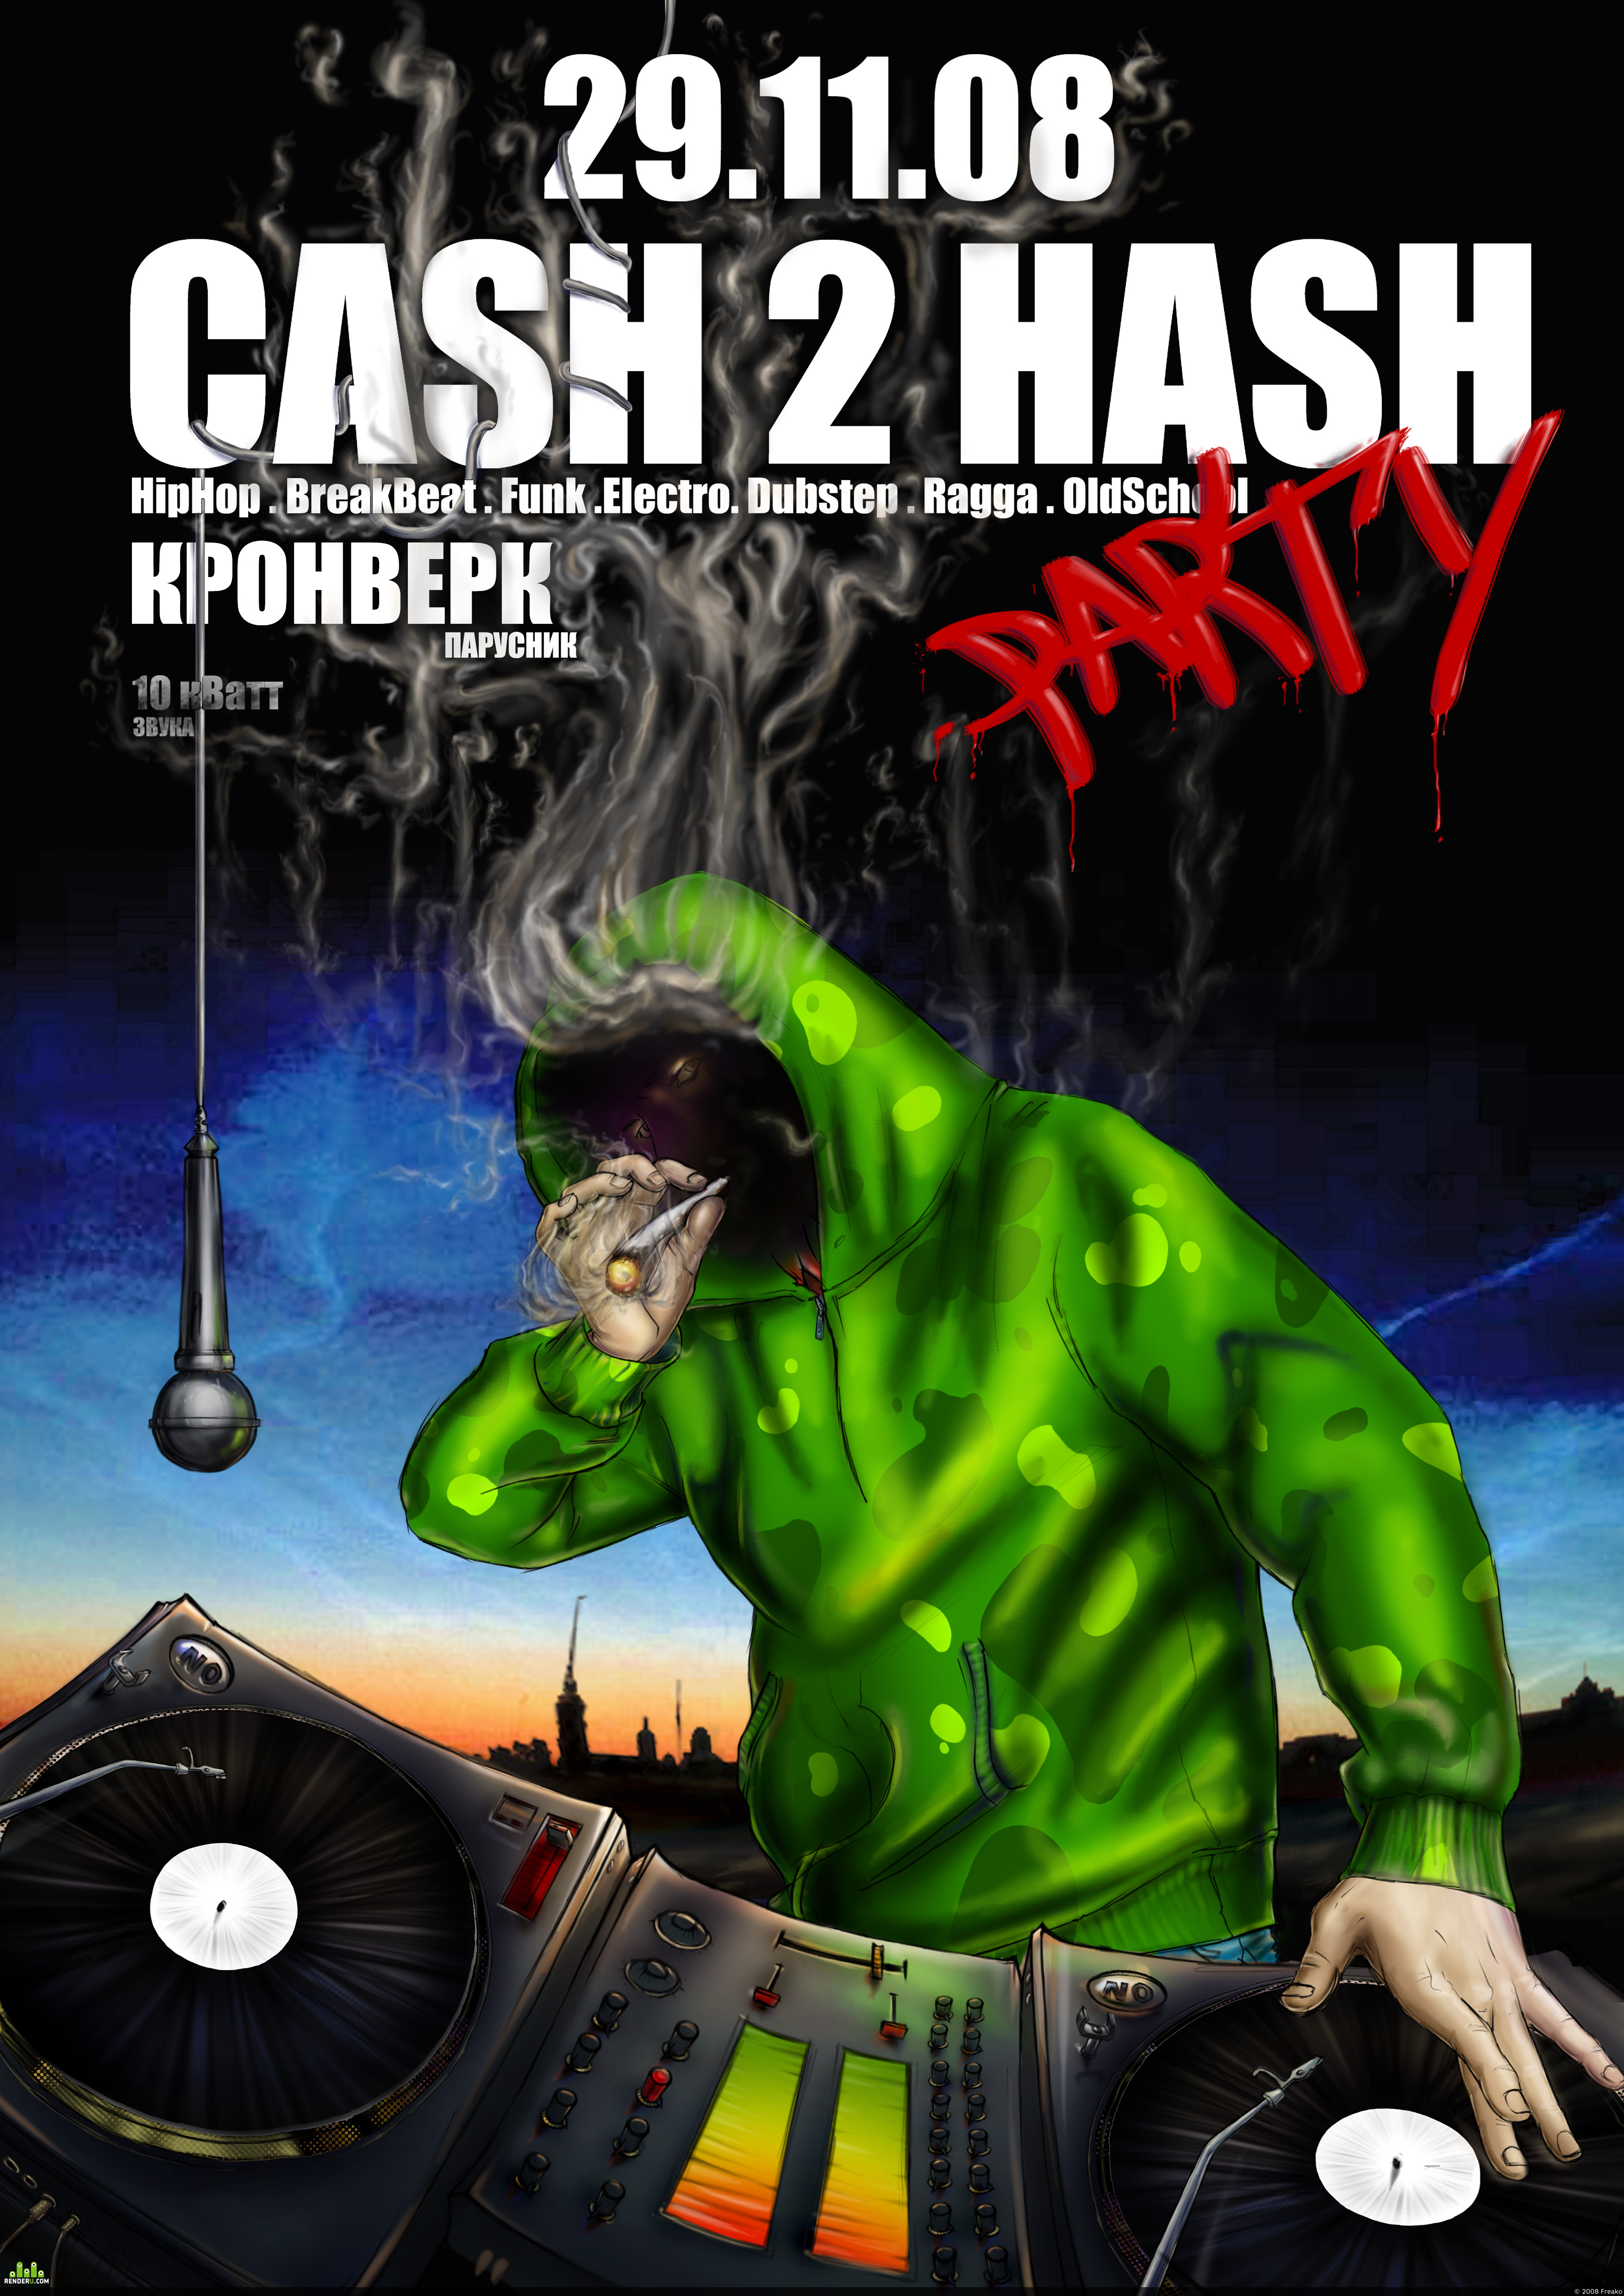 preview Cash 2 Hash party